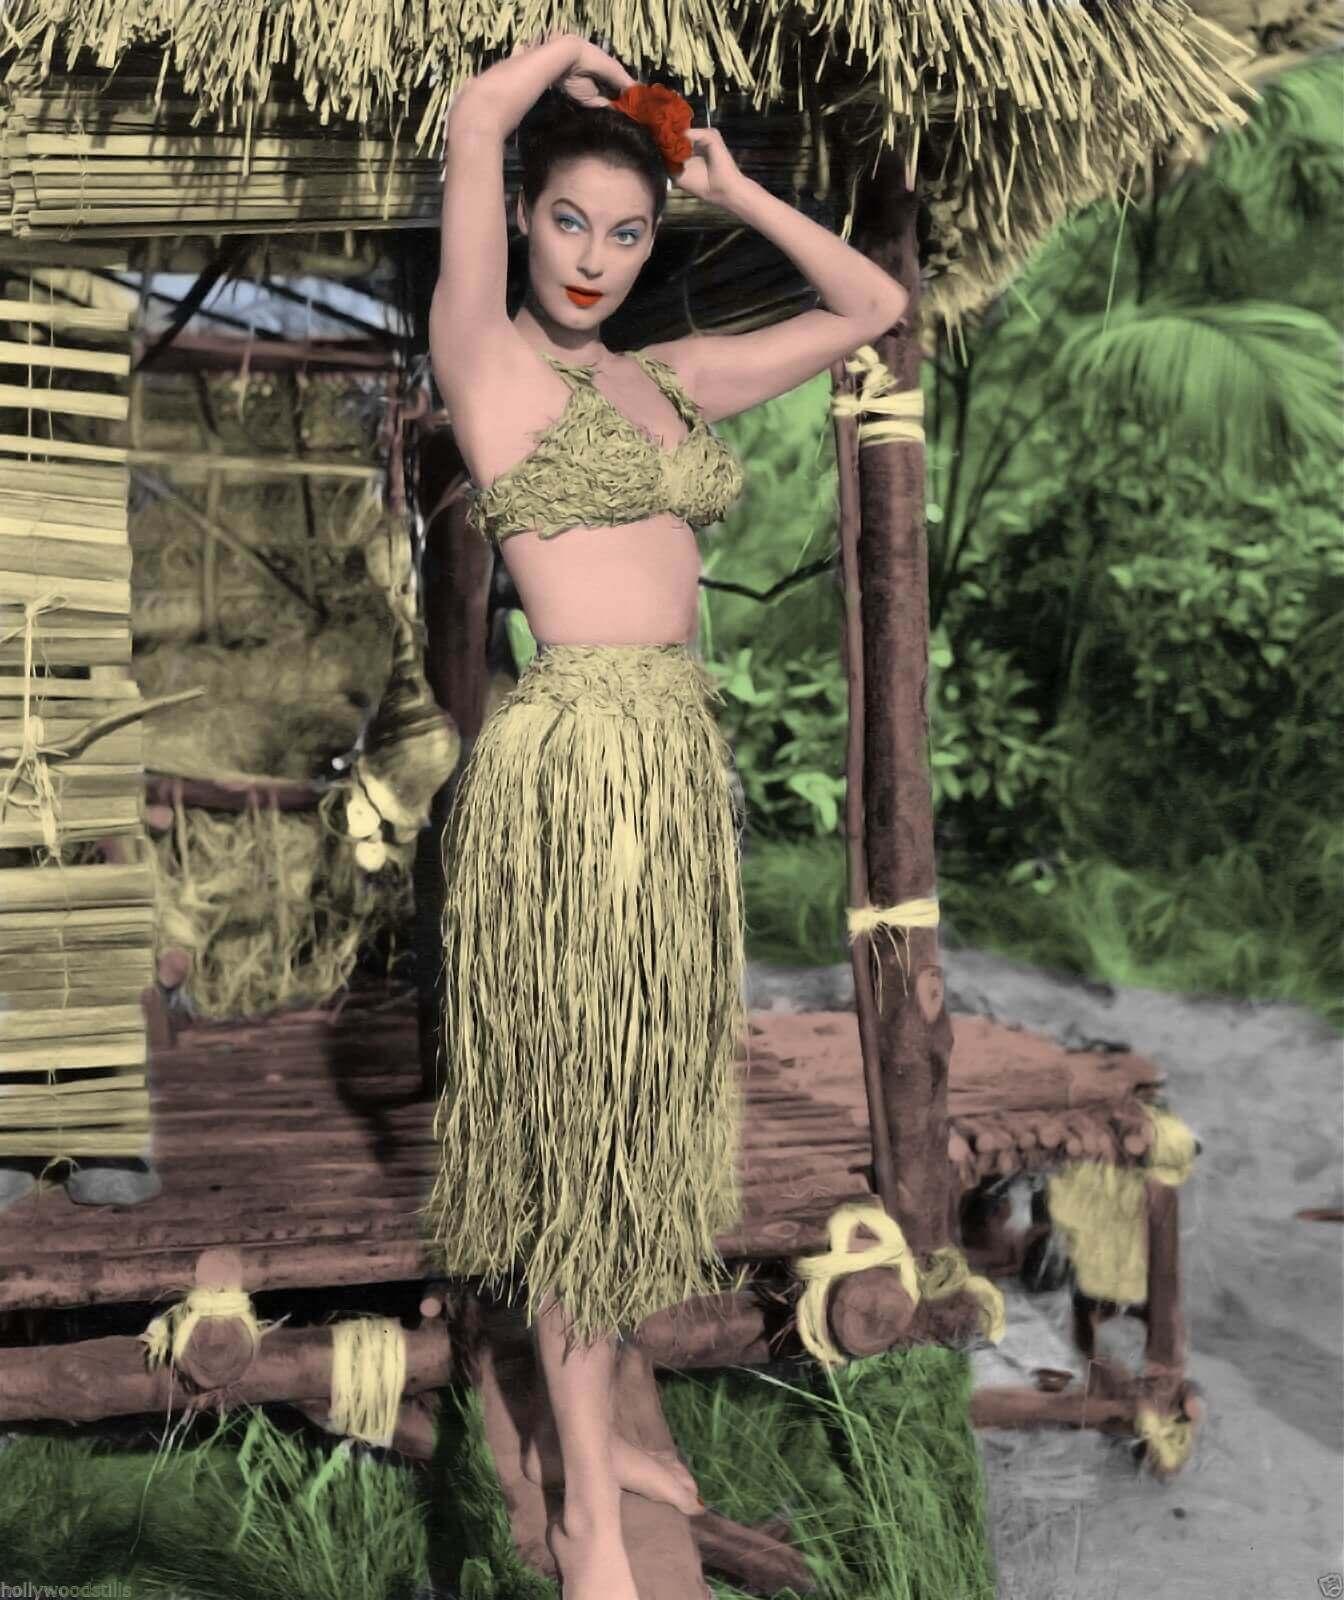 Ava Gardner hot pictures